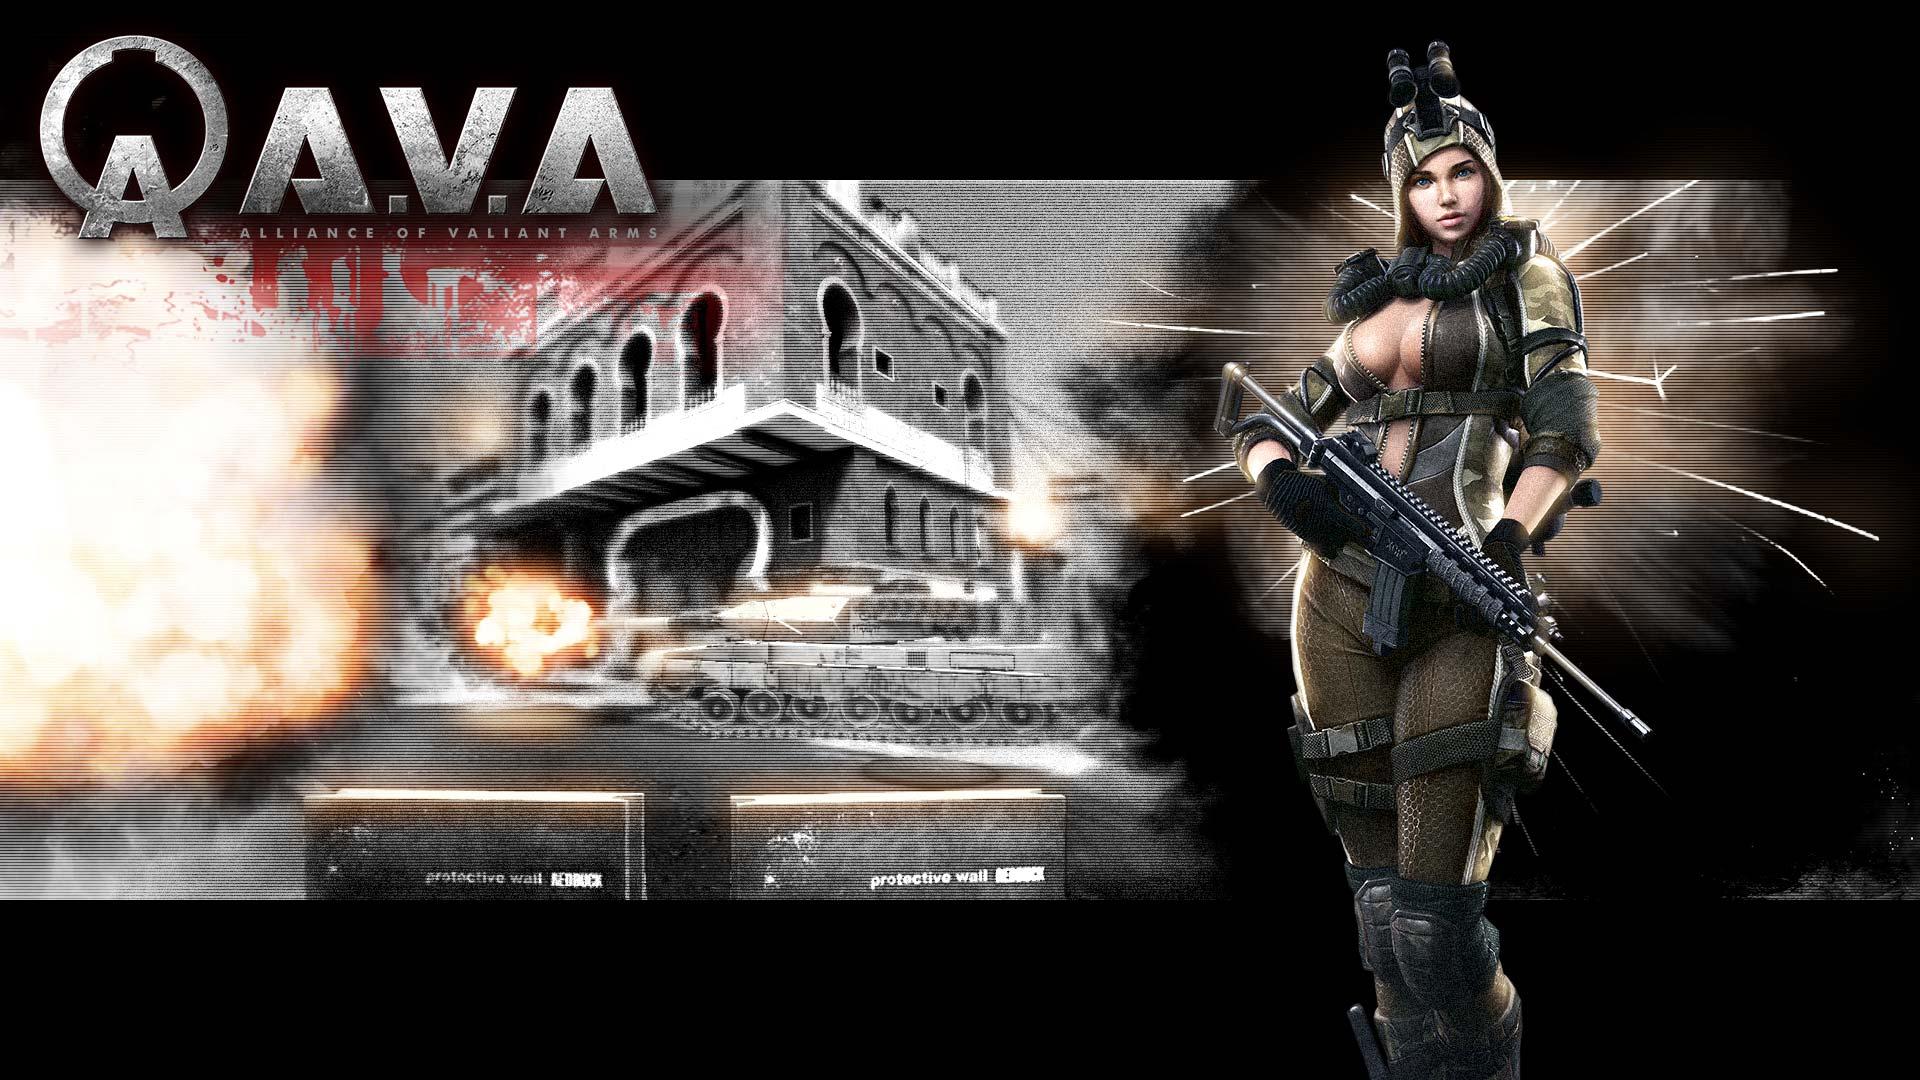 AVA Alliance of Valiant Arms Artwork 2.jpg